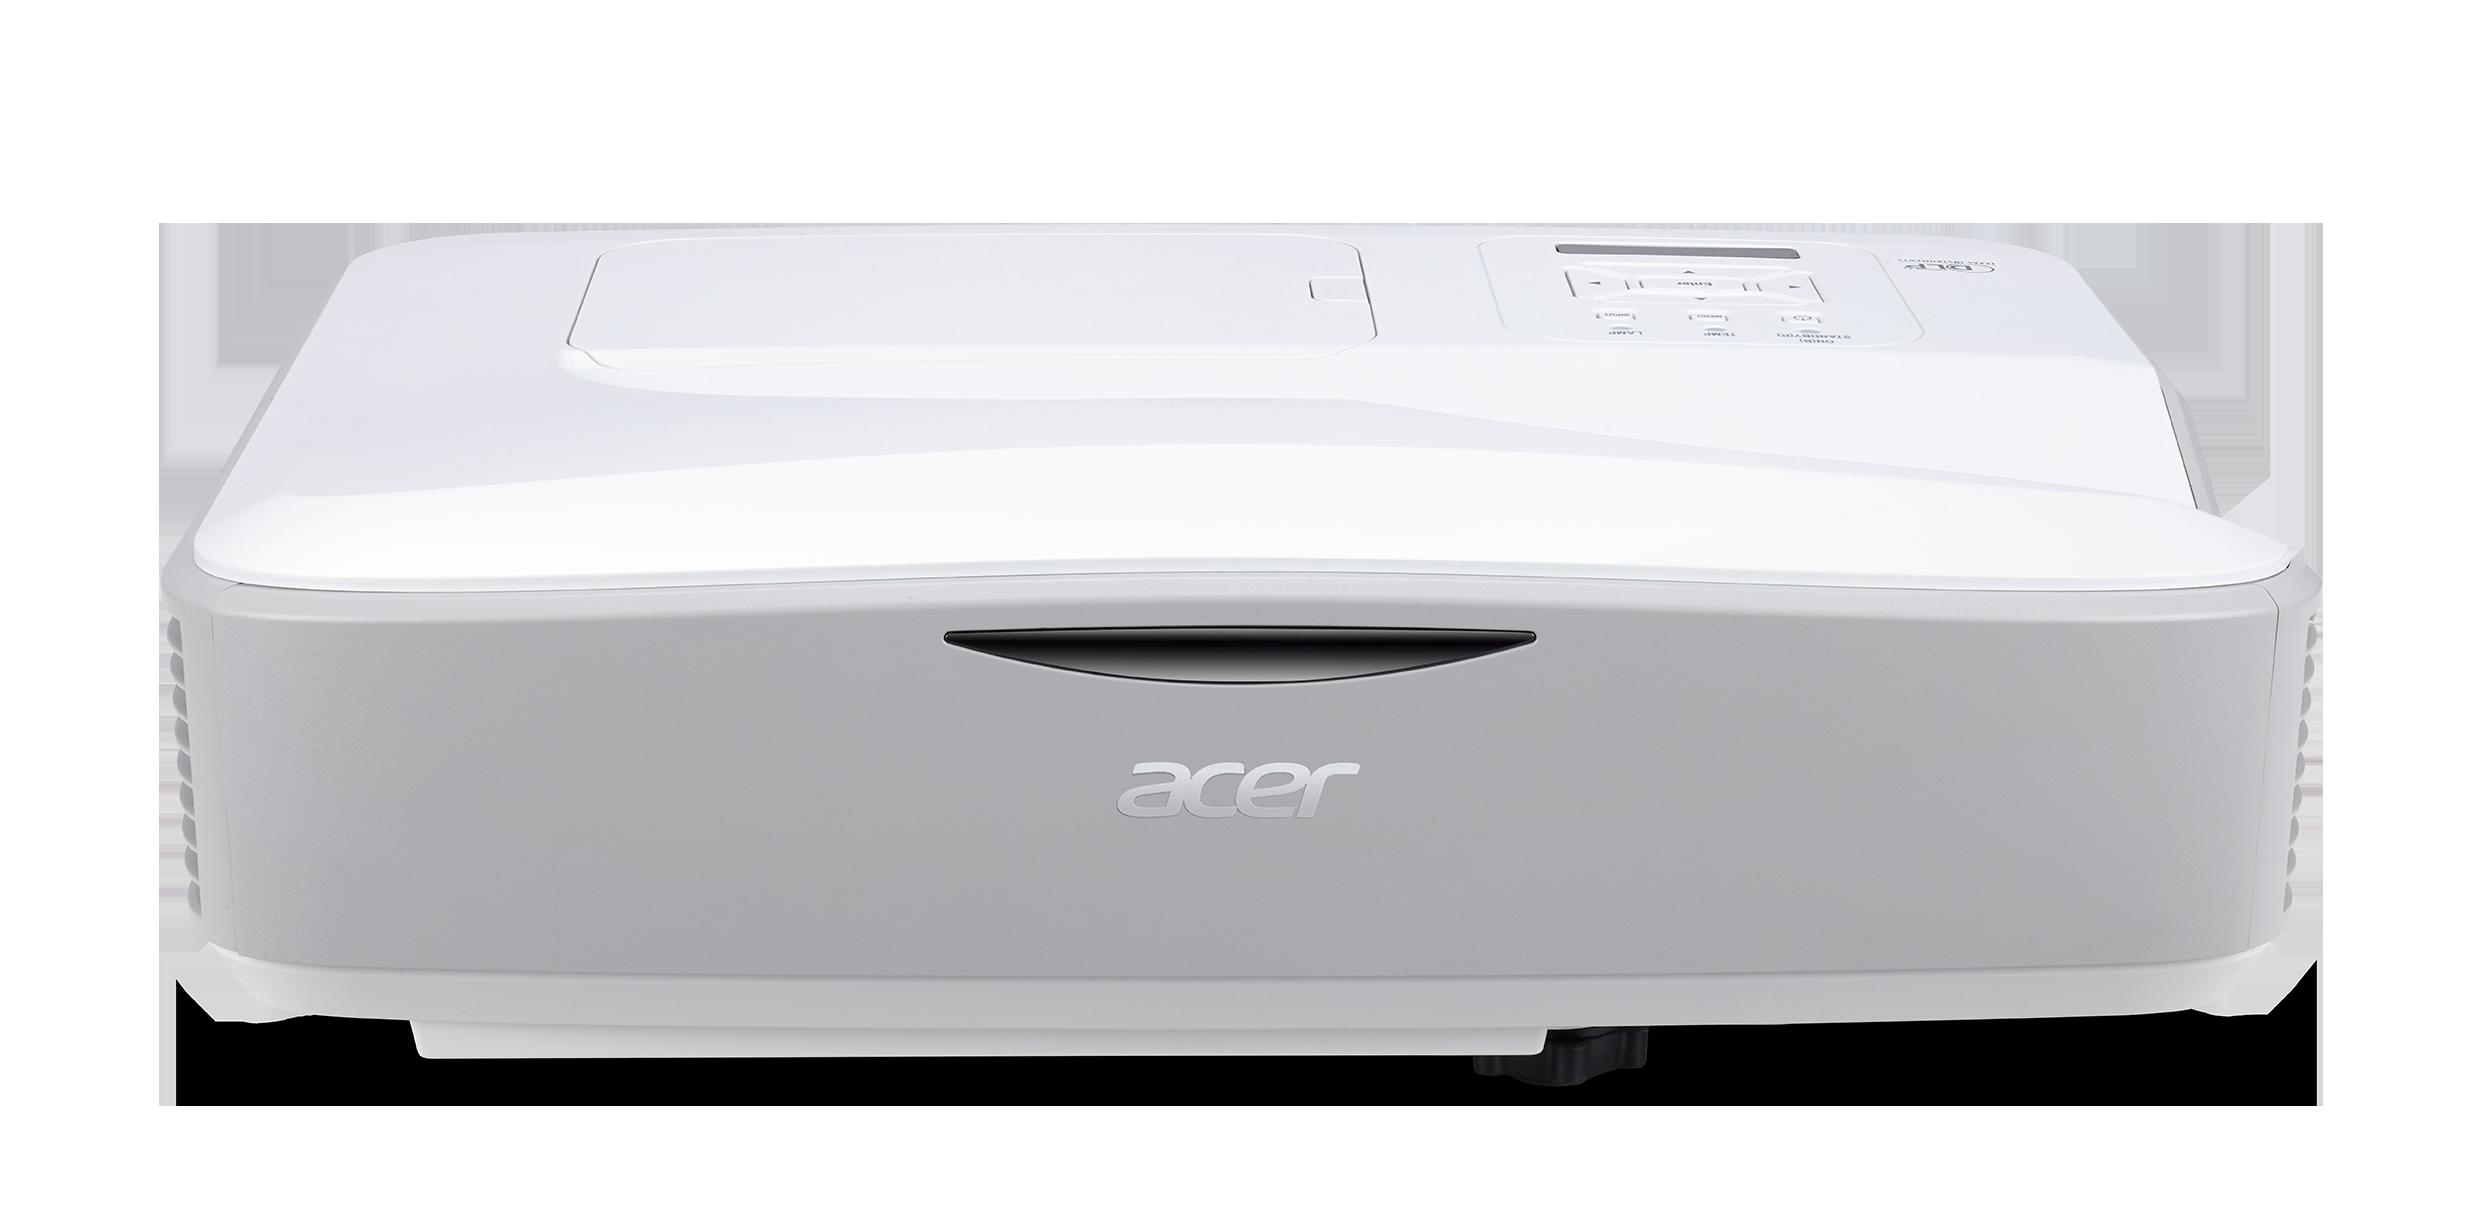 Acer DLP U5330W (UltraShortThrow) - 3300Lm, WXGA, 18000:1, HDMI, VGA, USB, repro., bílý